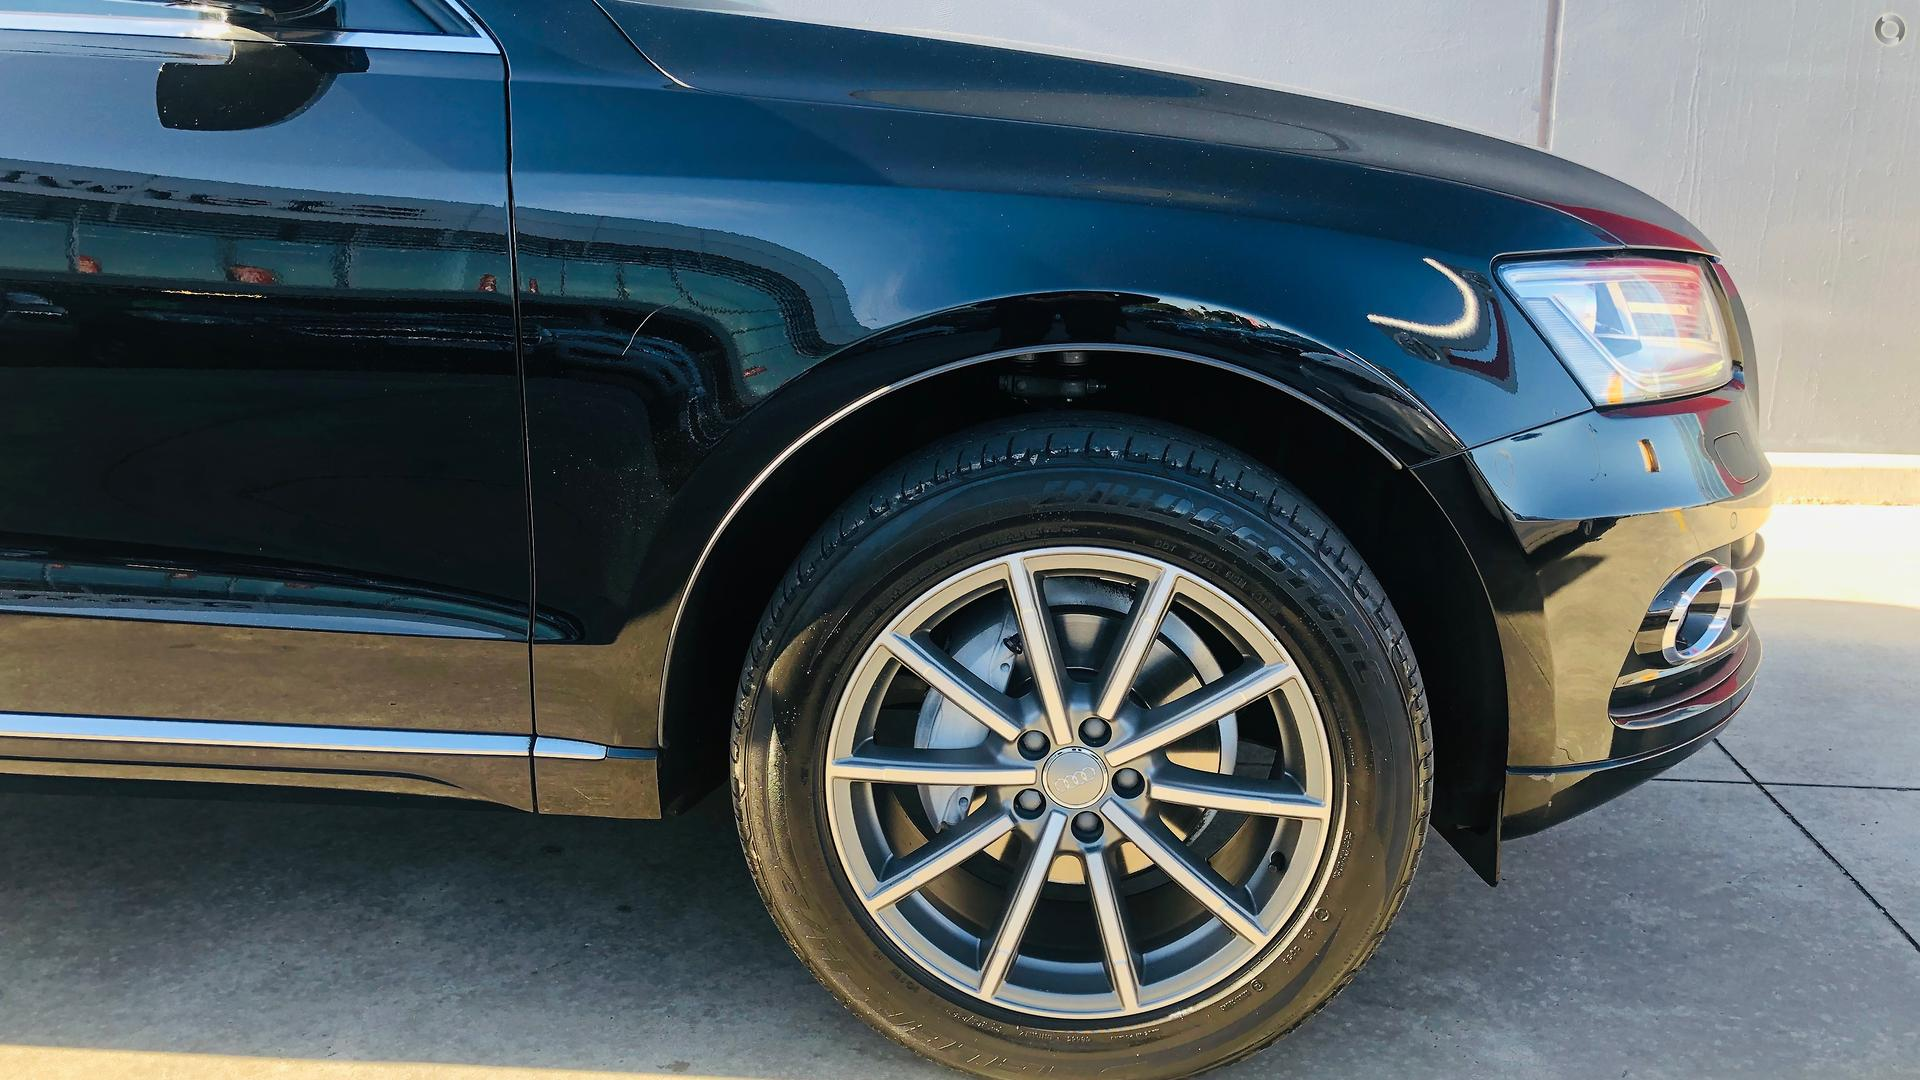 2016 Audi Q5 TFSI 8R